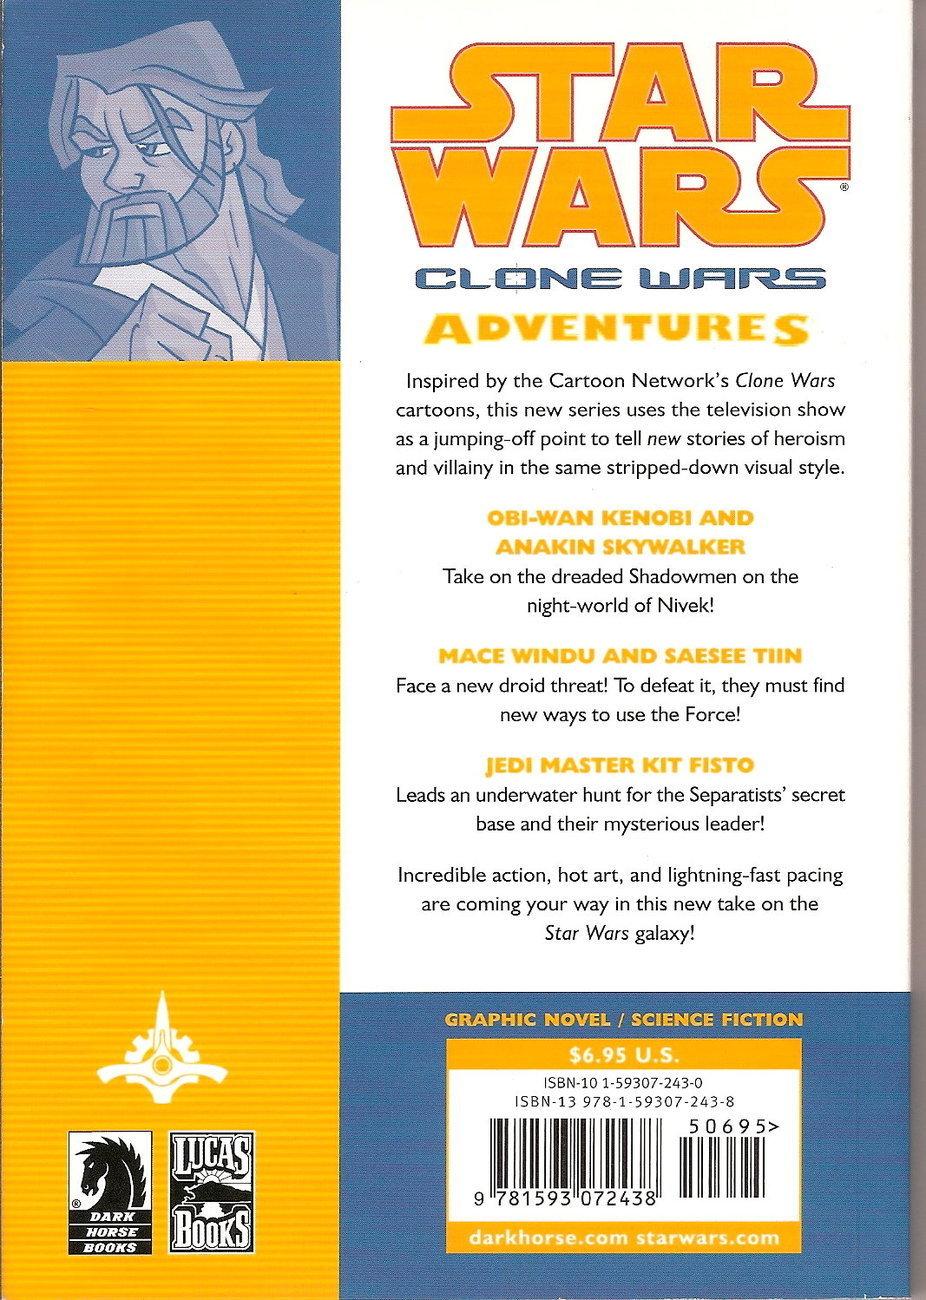 Image 1 of Clone Wars Adventures Vol 1 Star Wars Dark Horse Comic